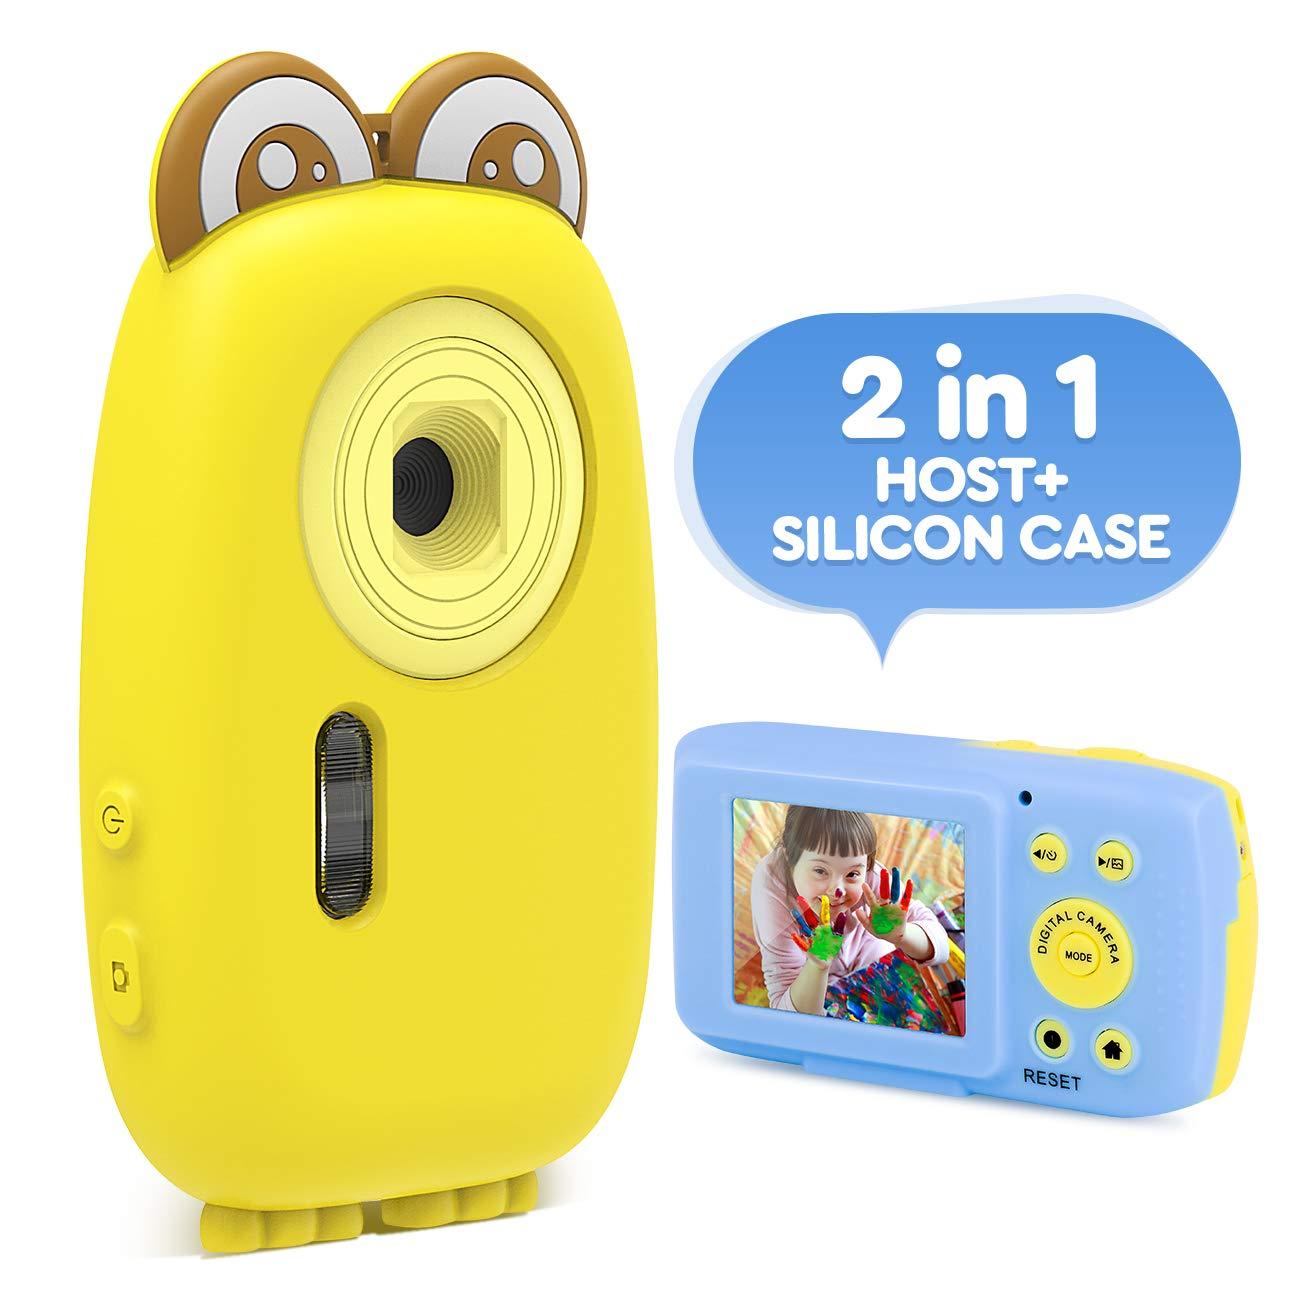 AMKOV Kids Camera Children Digital Cameras for Girls Boys Birthday Toy Gifts 3-8 Year Old Kid Action Camera Toddler Video Recorder 1080P IPS 2 Inch